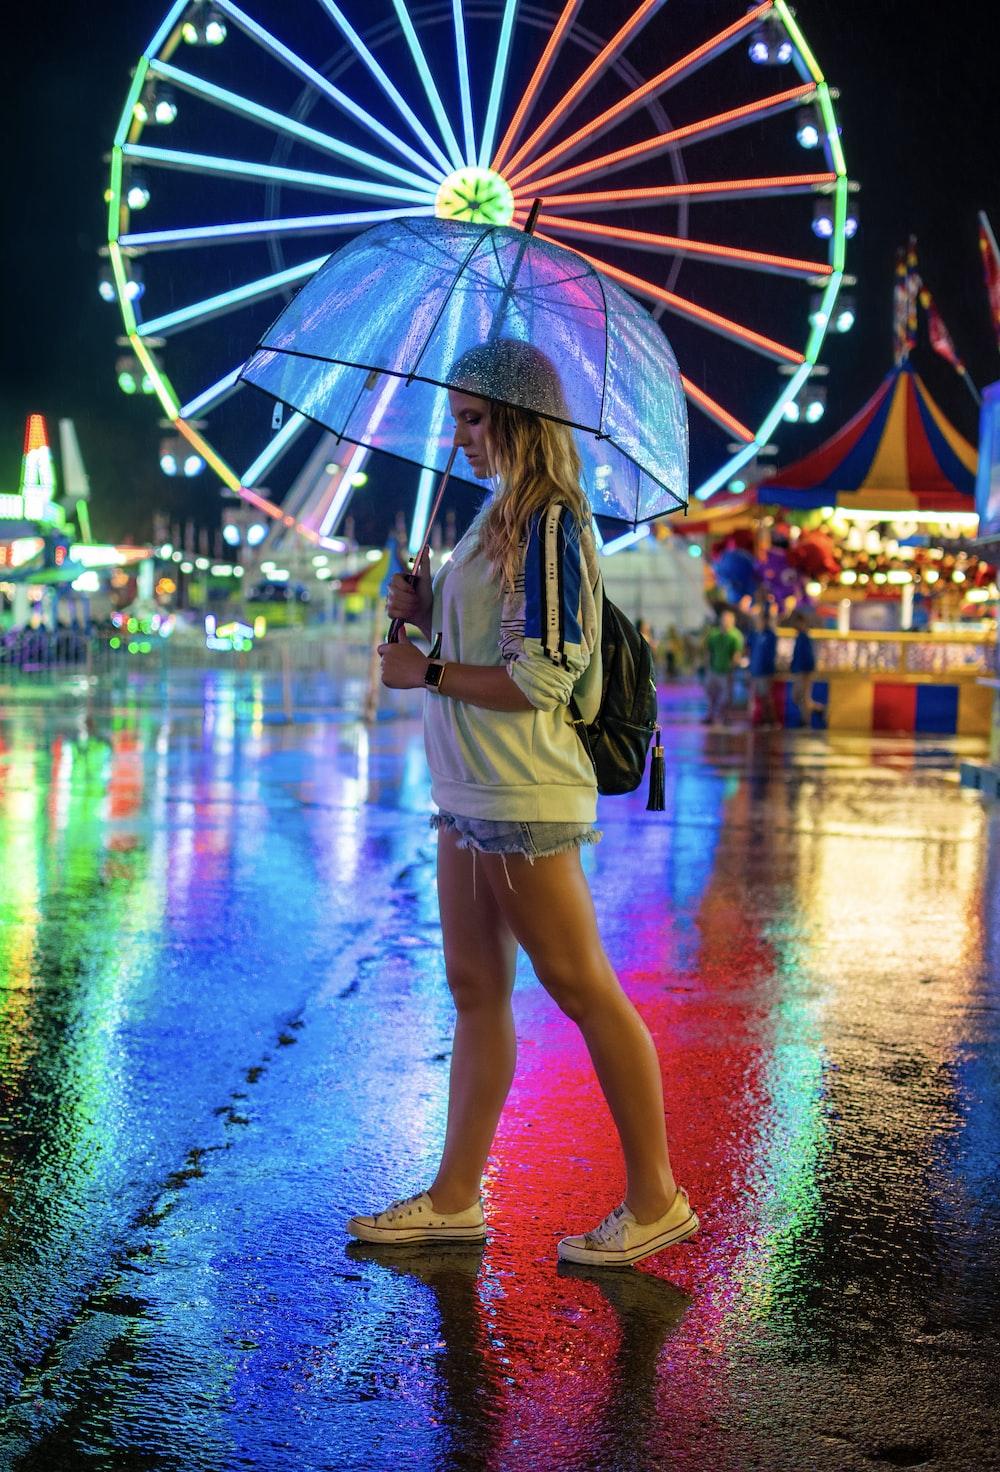 woman walking on pavement holding umbrella